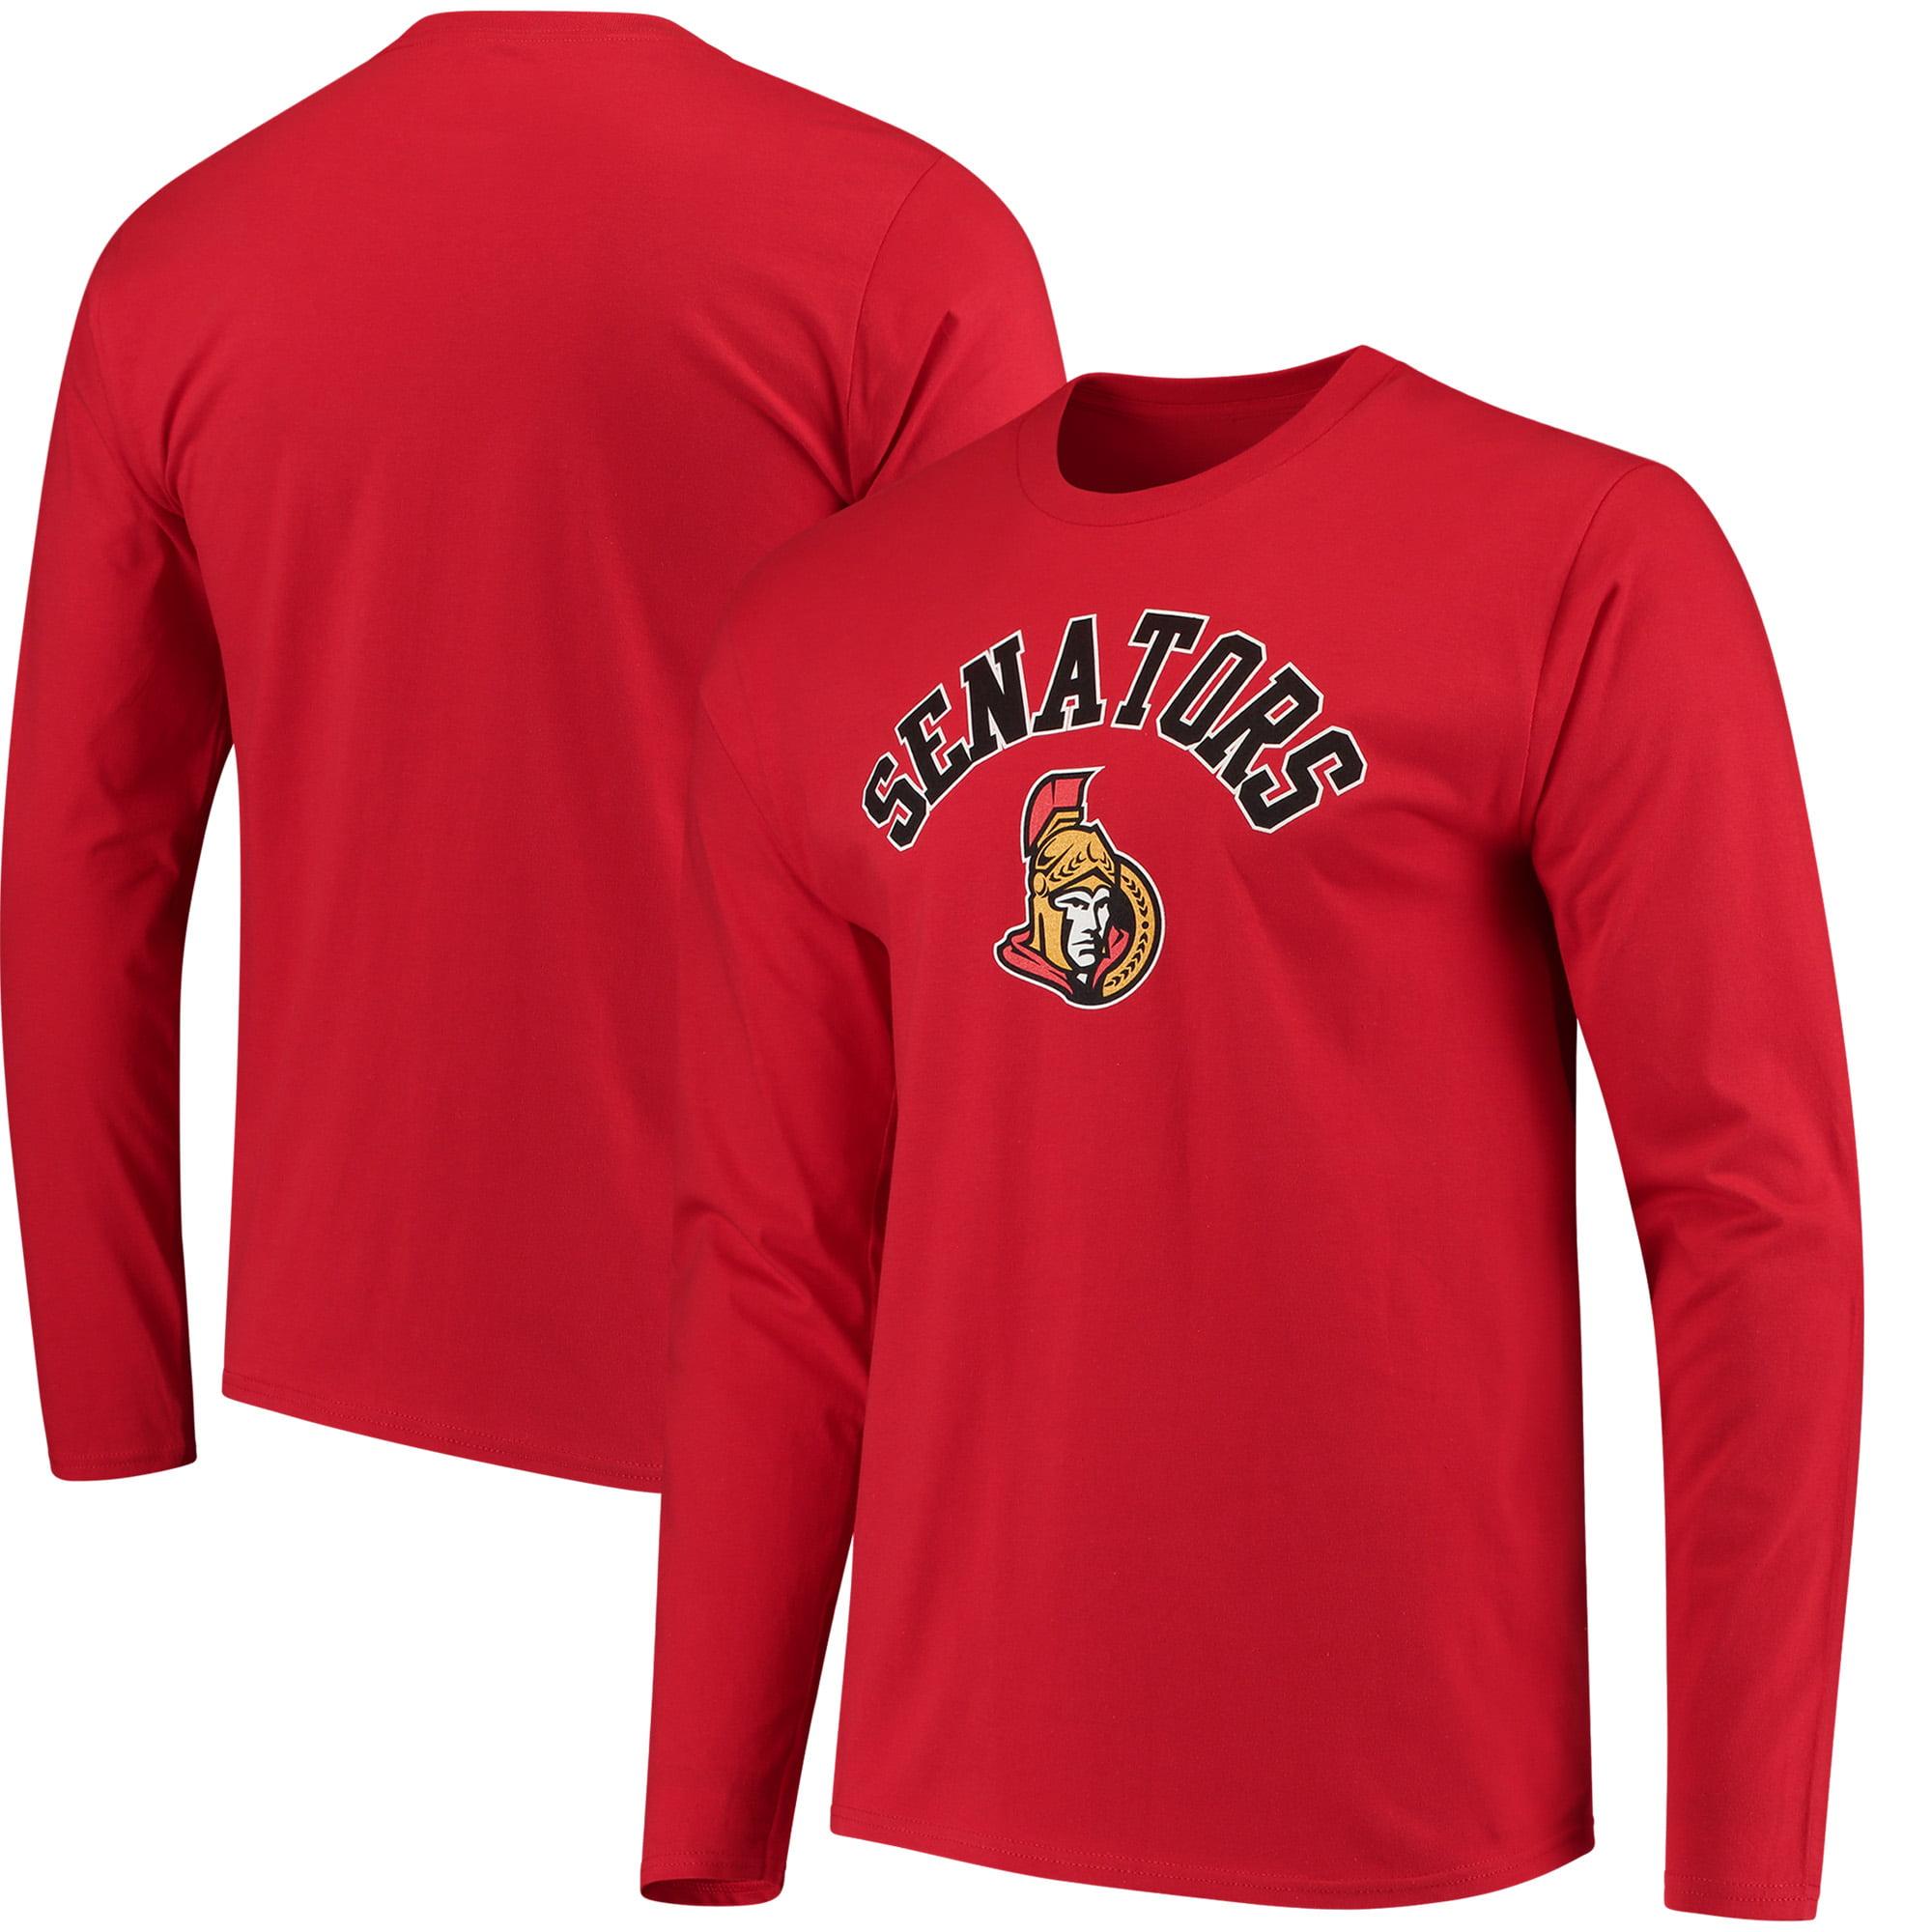 Ottawa Senators Fanatics Branded Door Arch Long Sleeve T-Shirt - Red